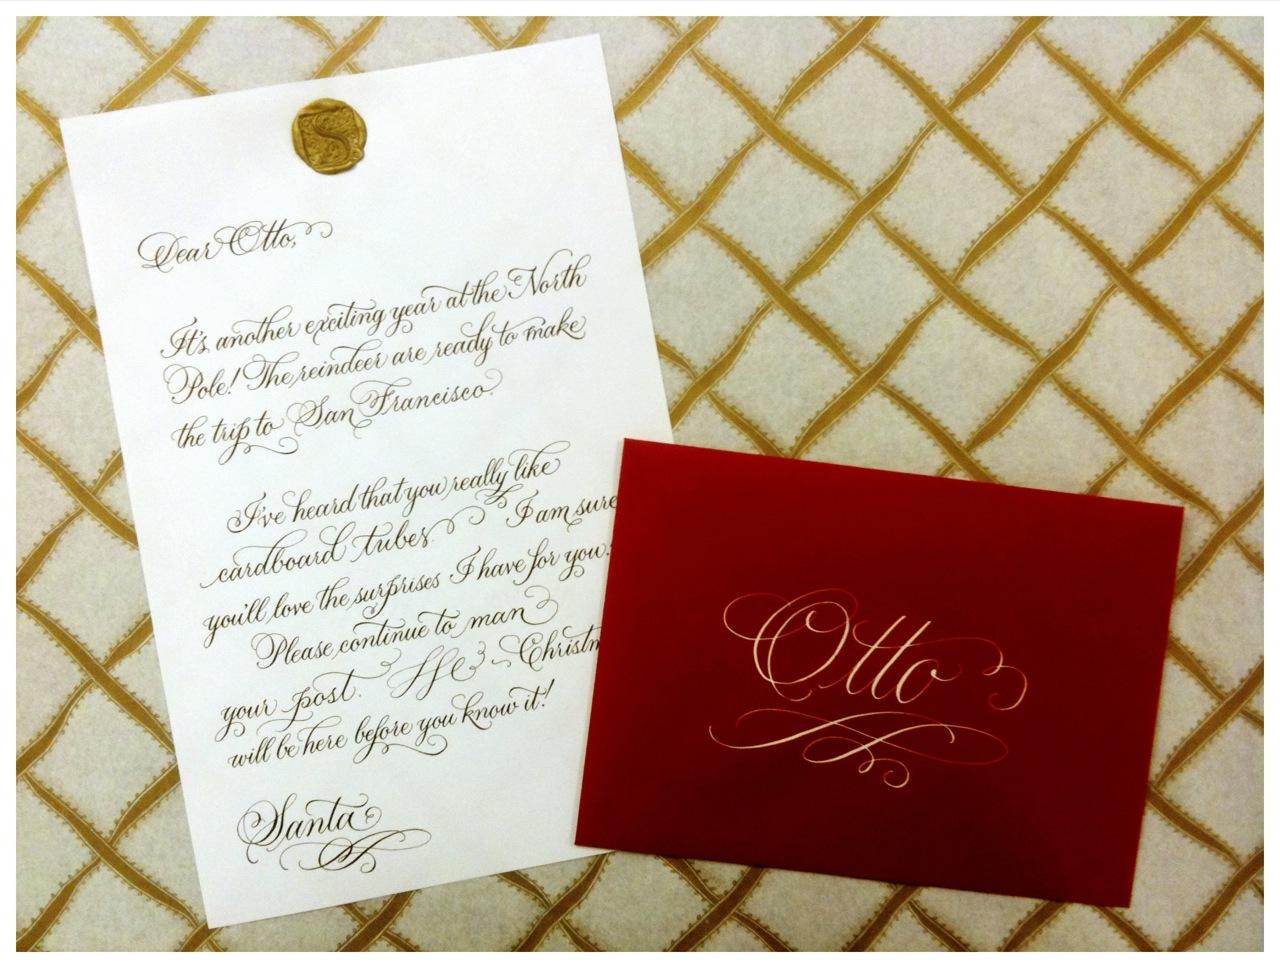 Calligraphic Santa letter by Sarah Hannah